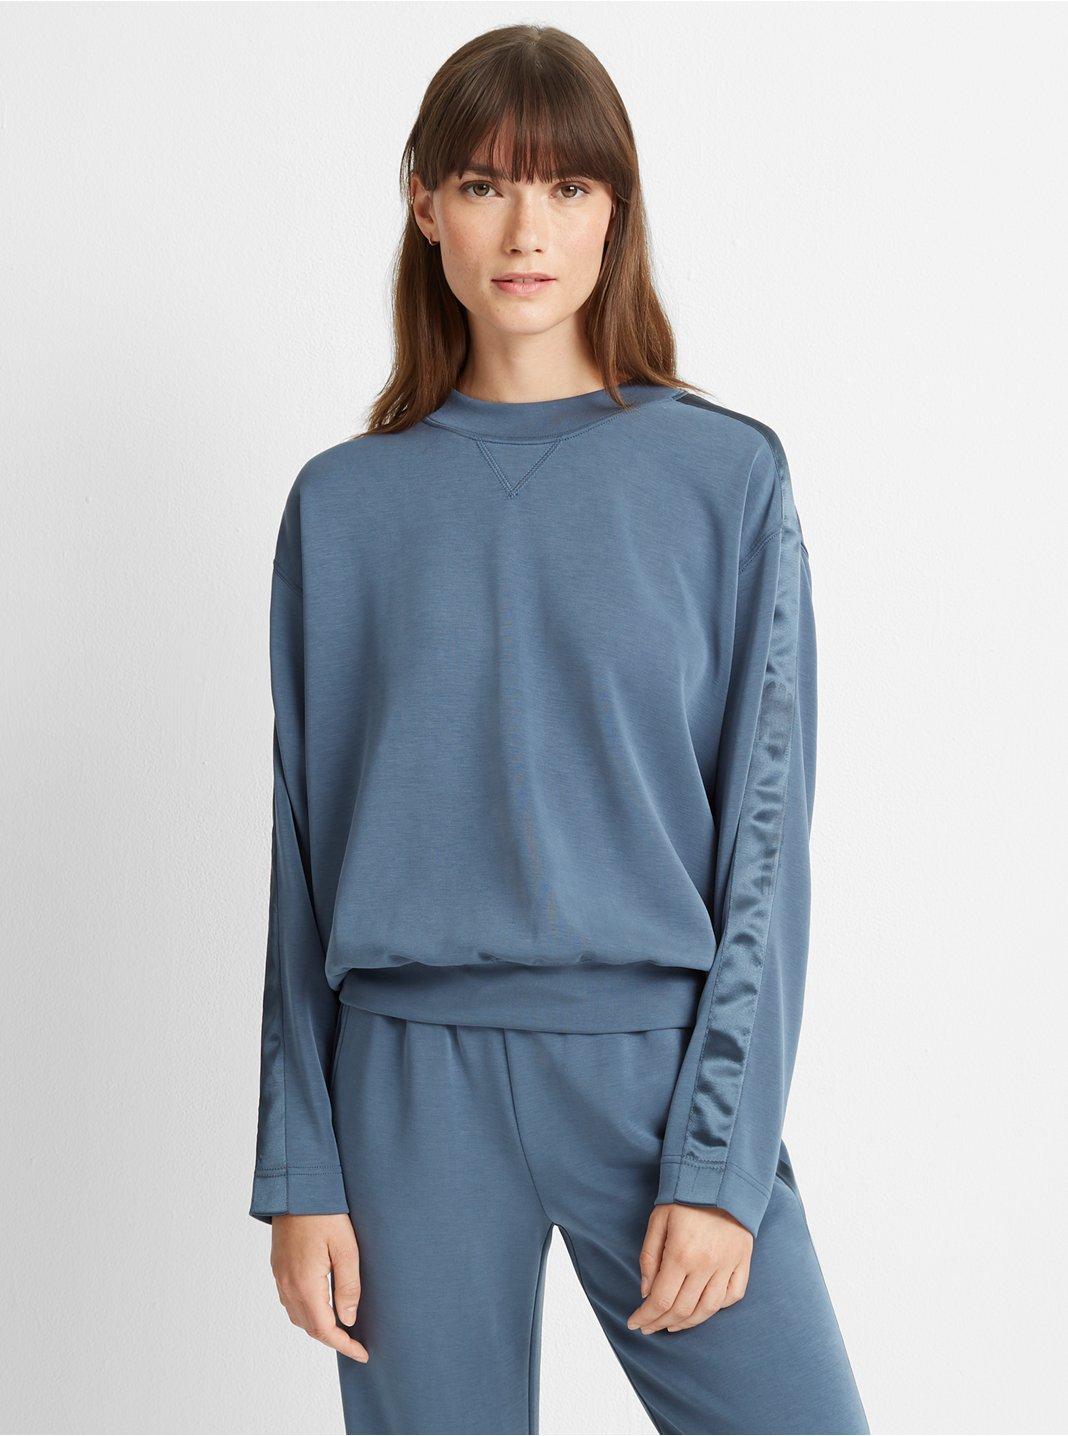 Satin Stripe Sweatshirt